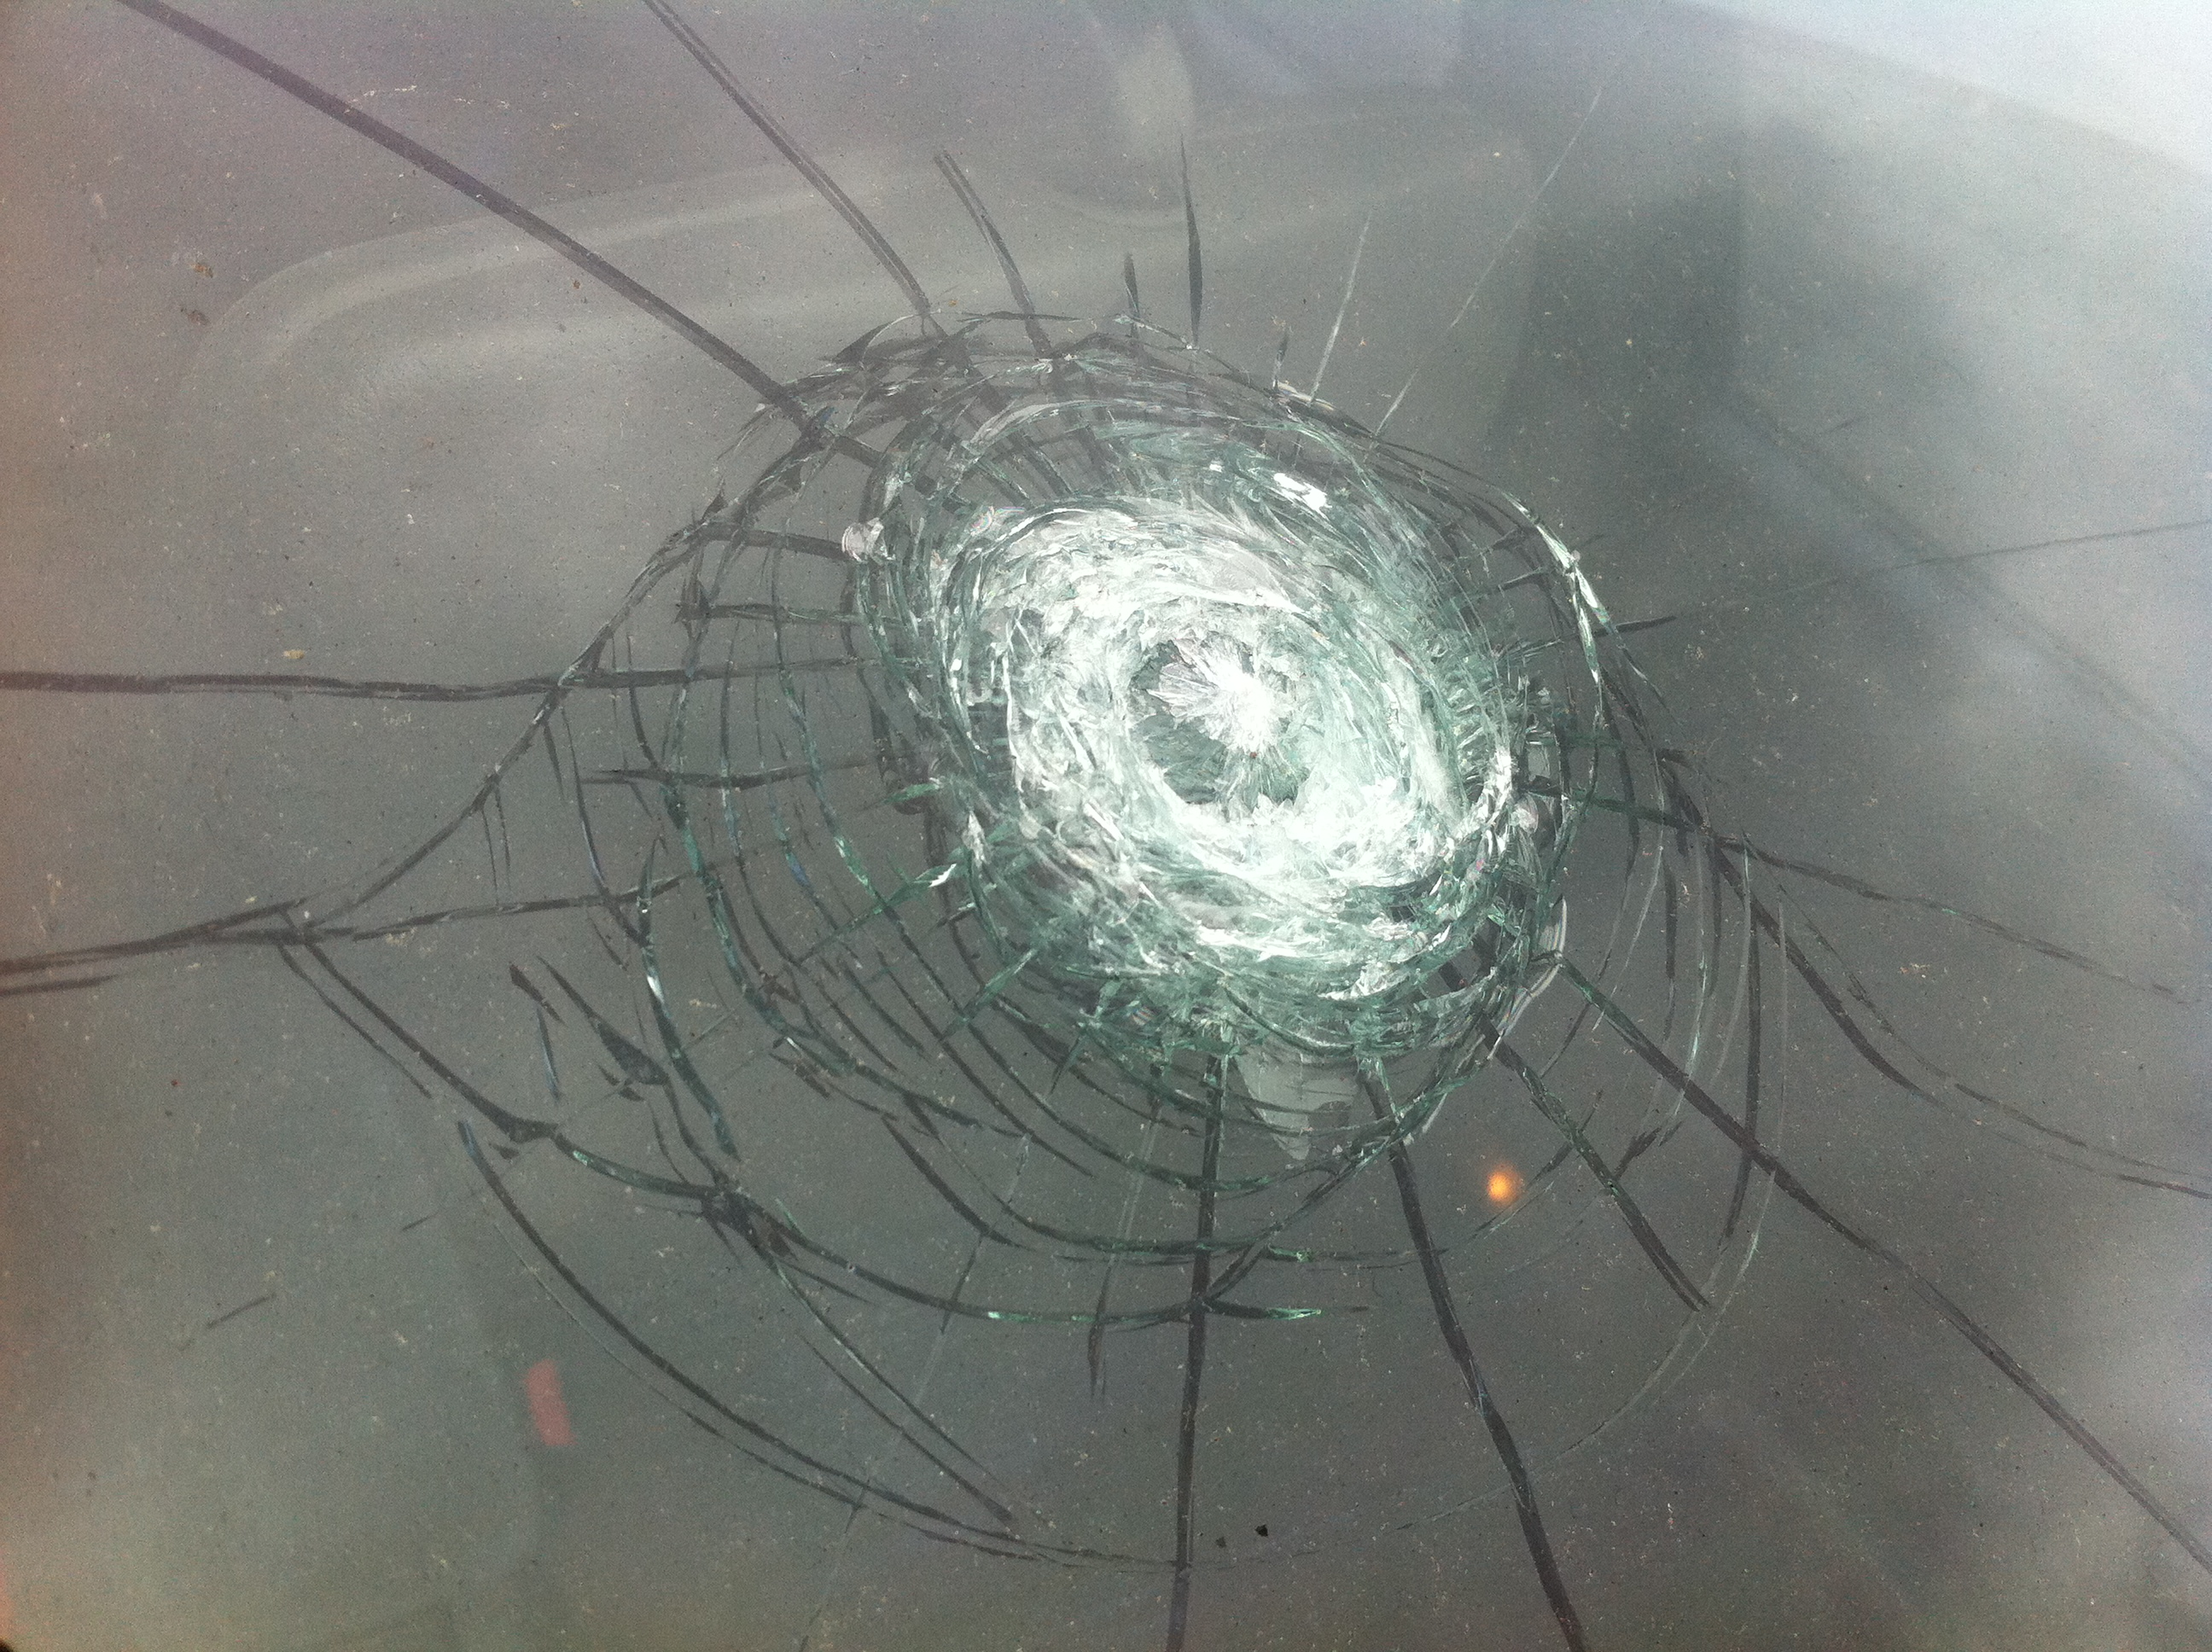 windscreen crack repairs auckland auckland windscreens